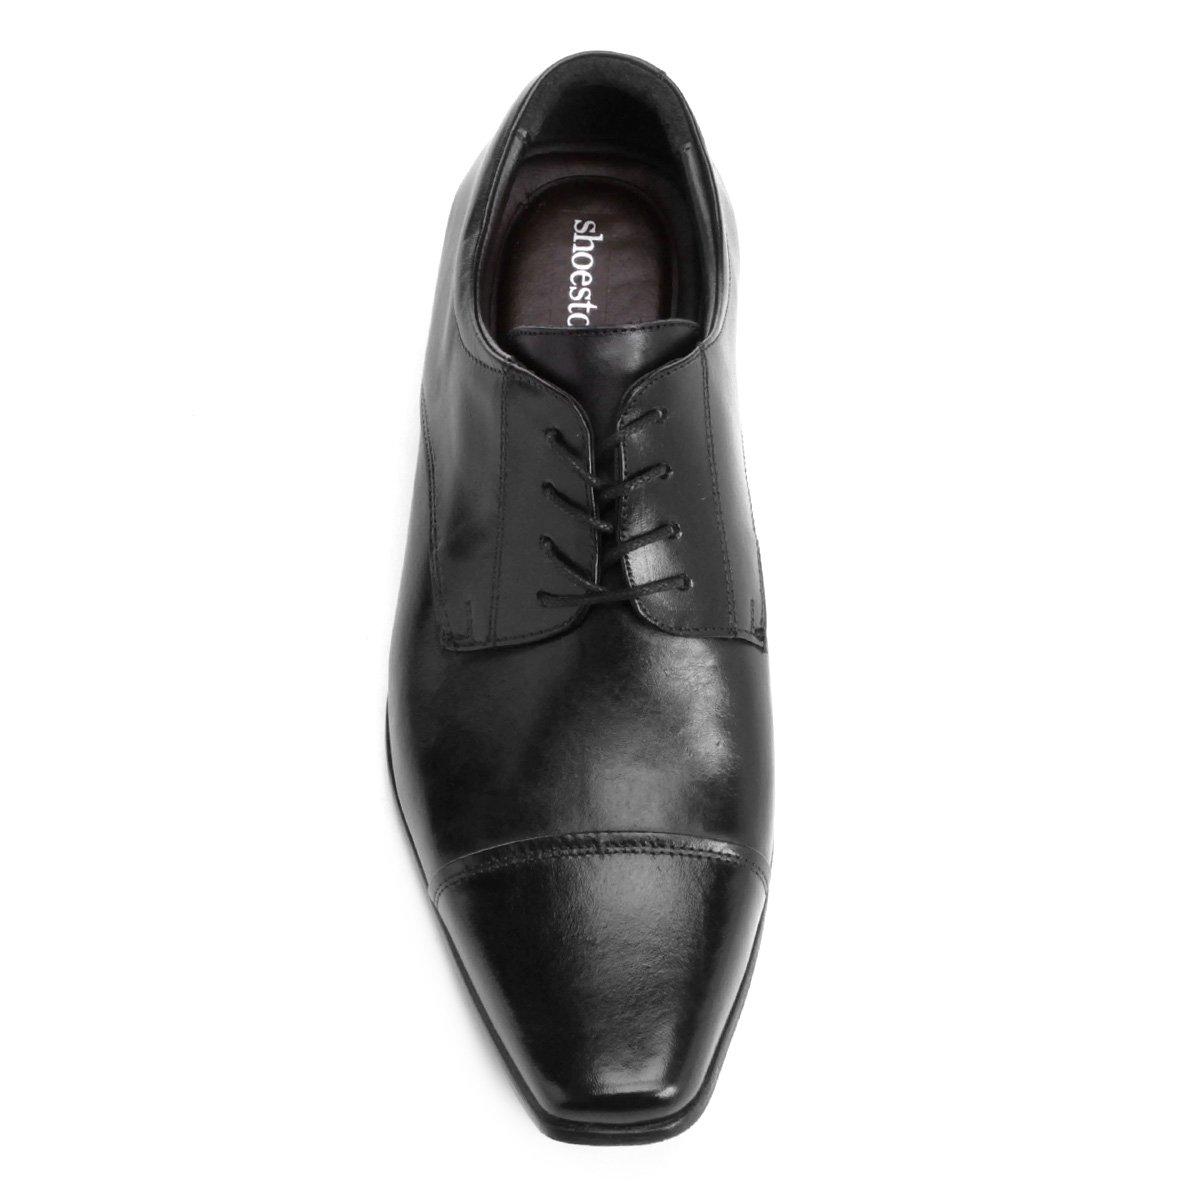 Shoestock Bico Shoestock Couro Quadrado Couro Social Sapato Bico Preto Social Sapato dS0Wnn